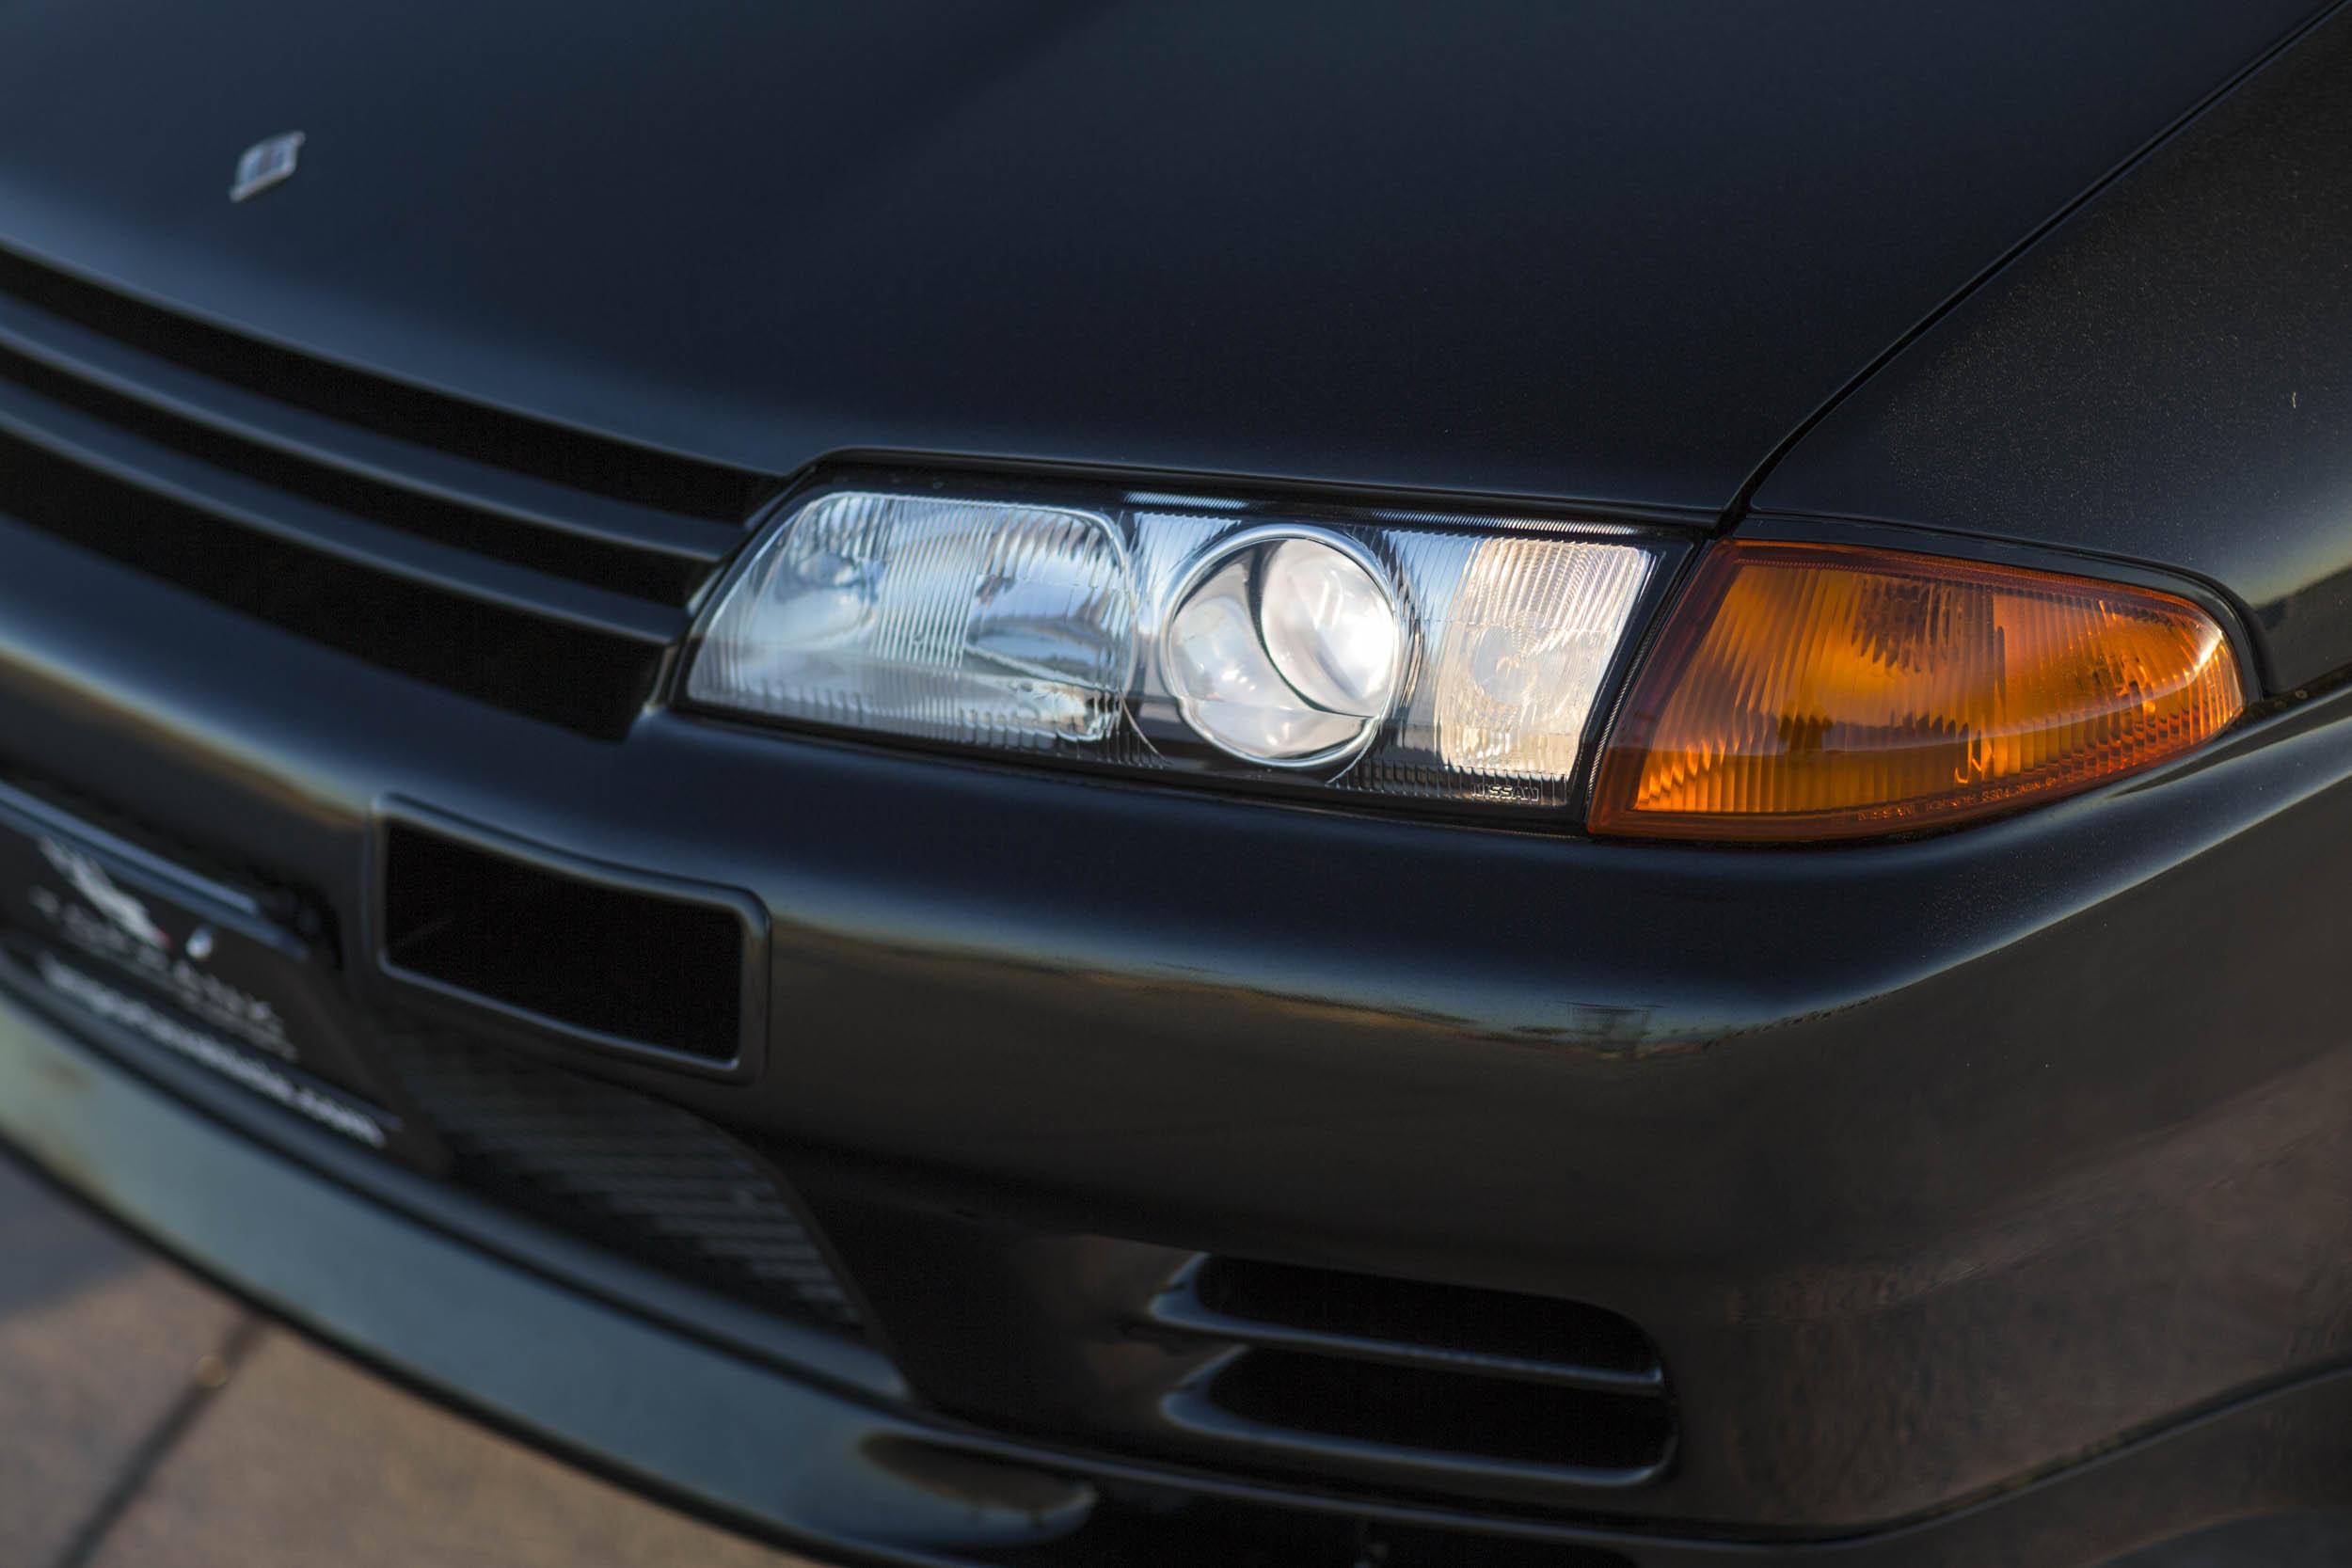 Nissan R32 GT-R nose